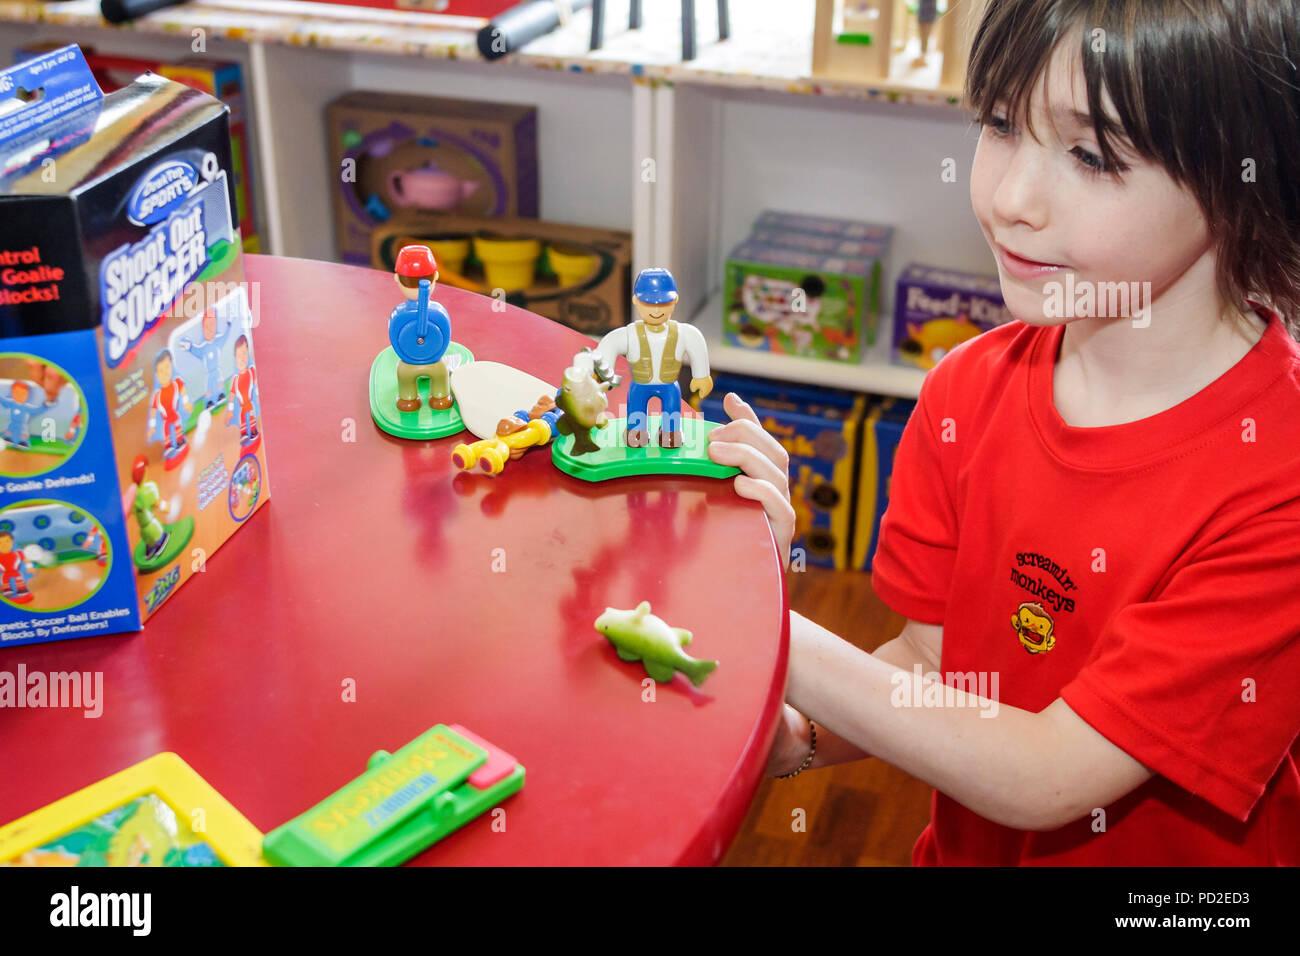 Action Figure Shop Stockfotos & Action Figure Shop Bilder - Alamy